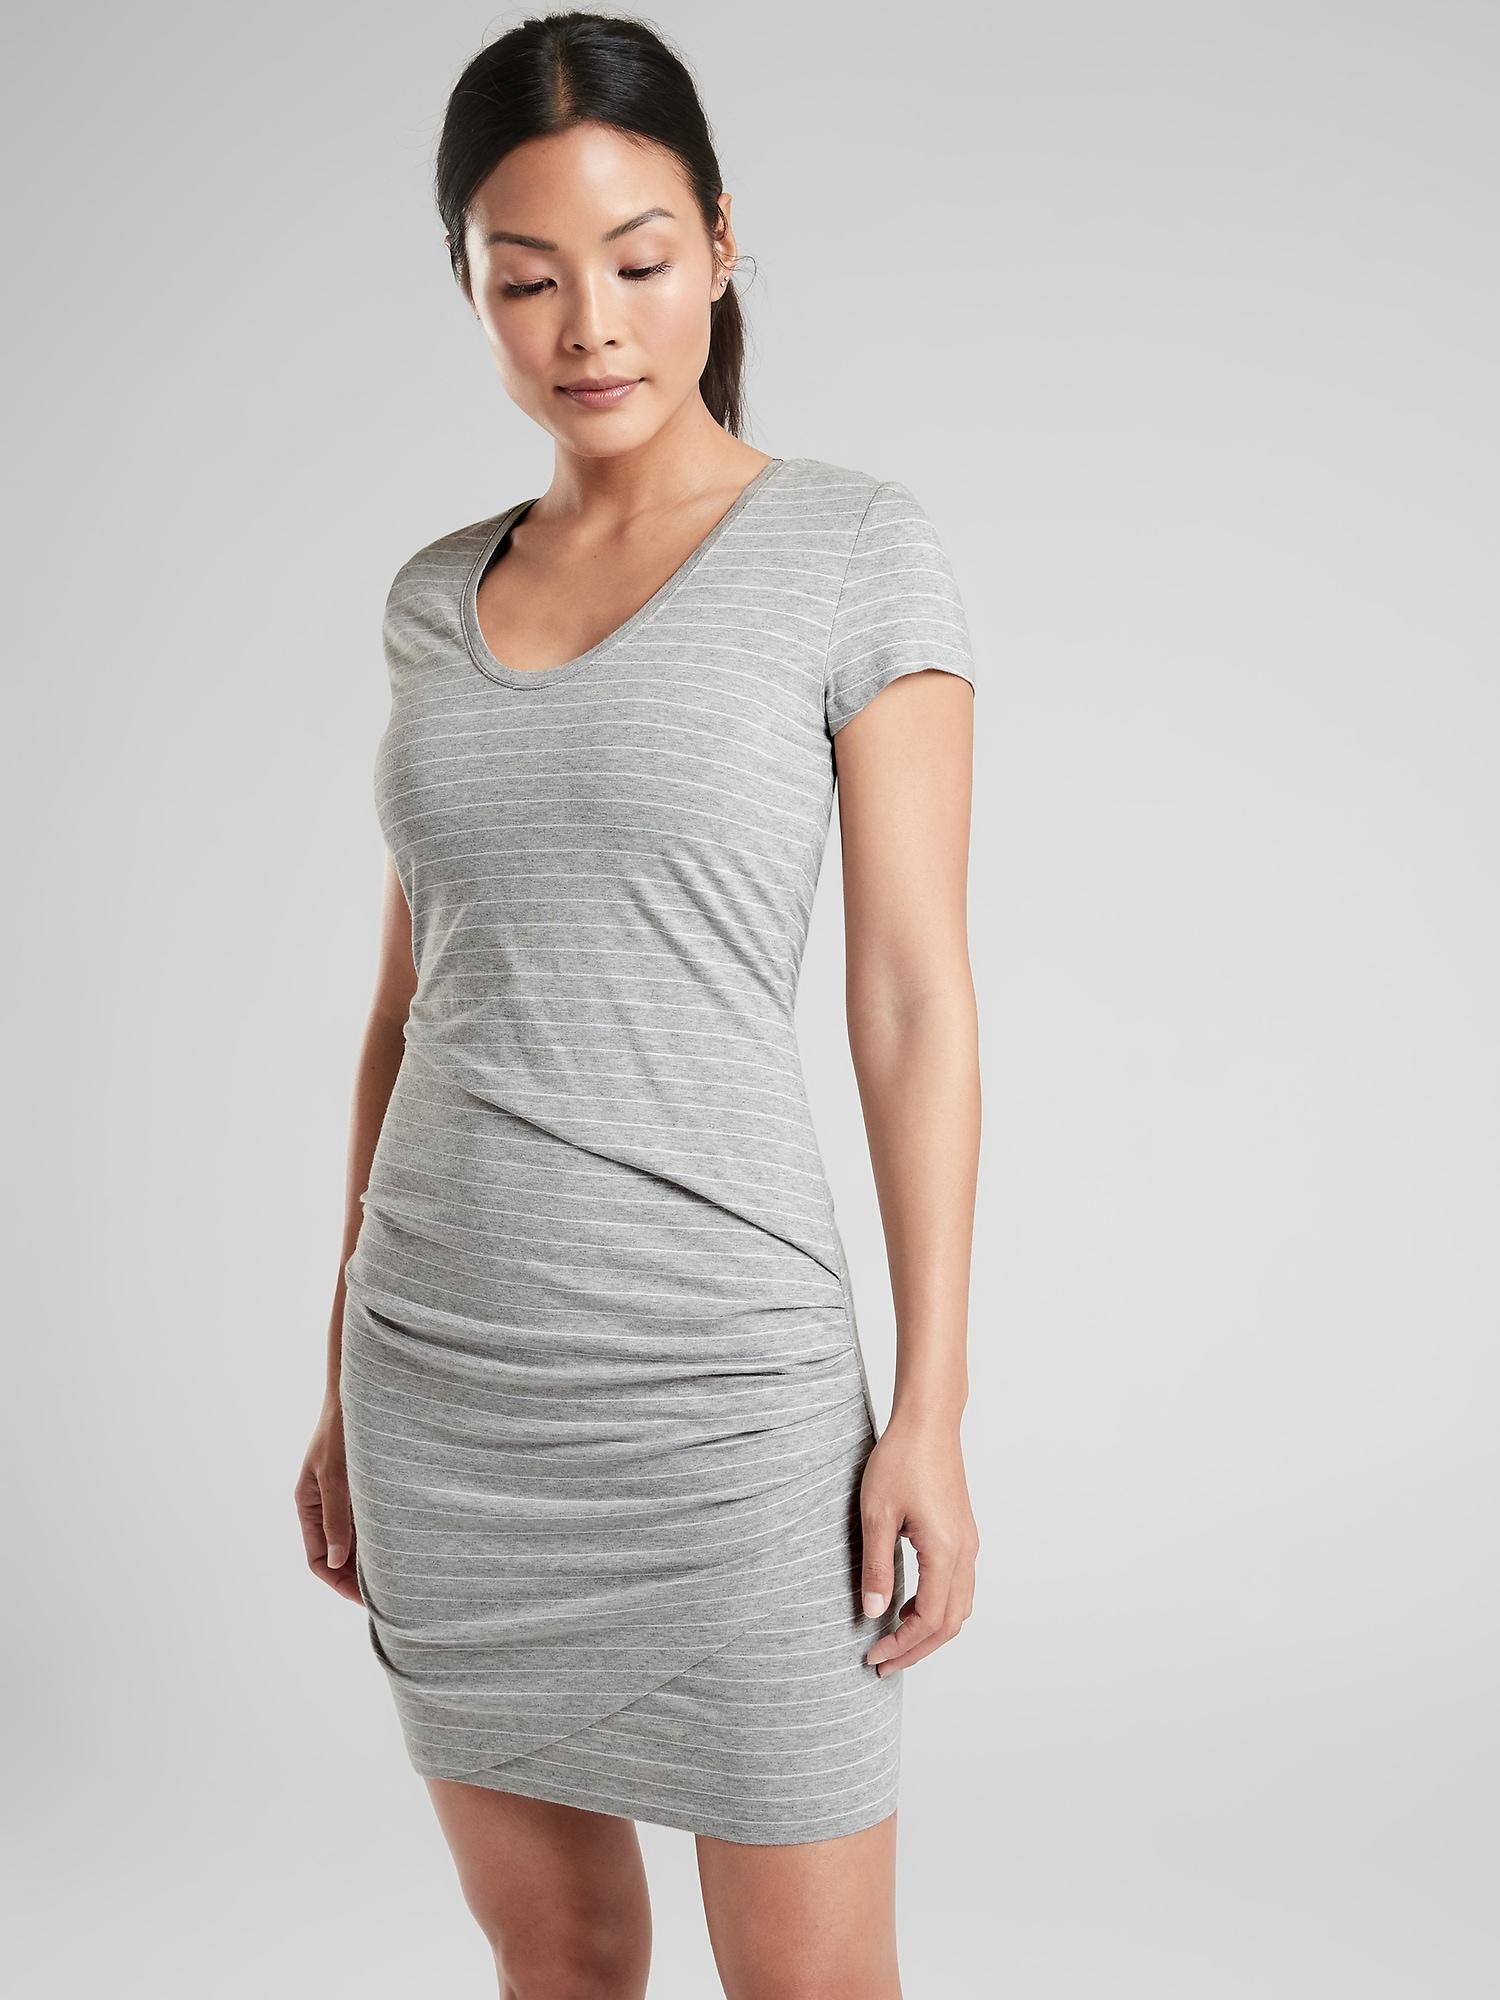 248def1a14f Athleta - Gray Central Stripe Dress - Lyst. View fullscreen